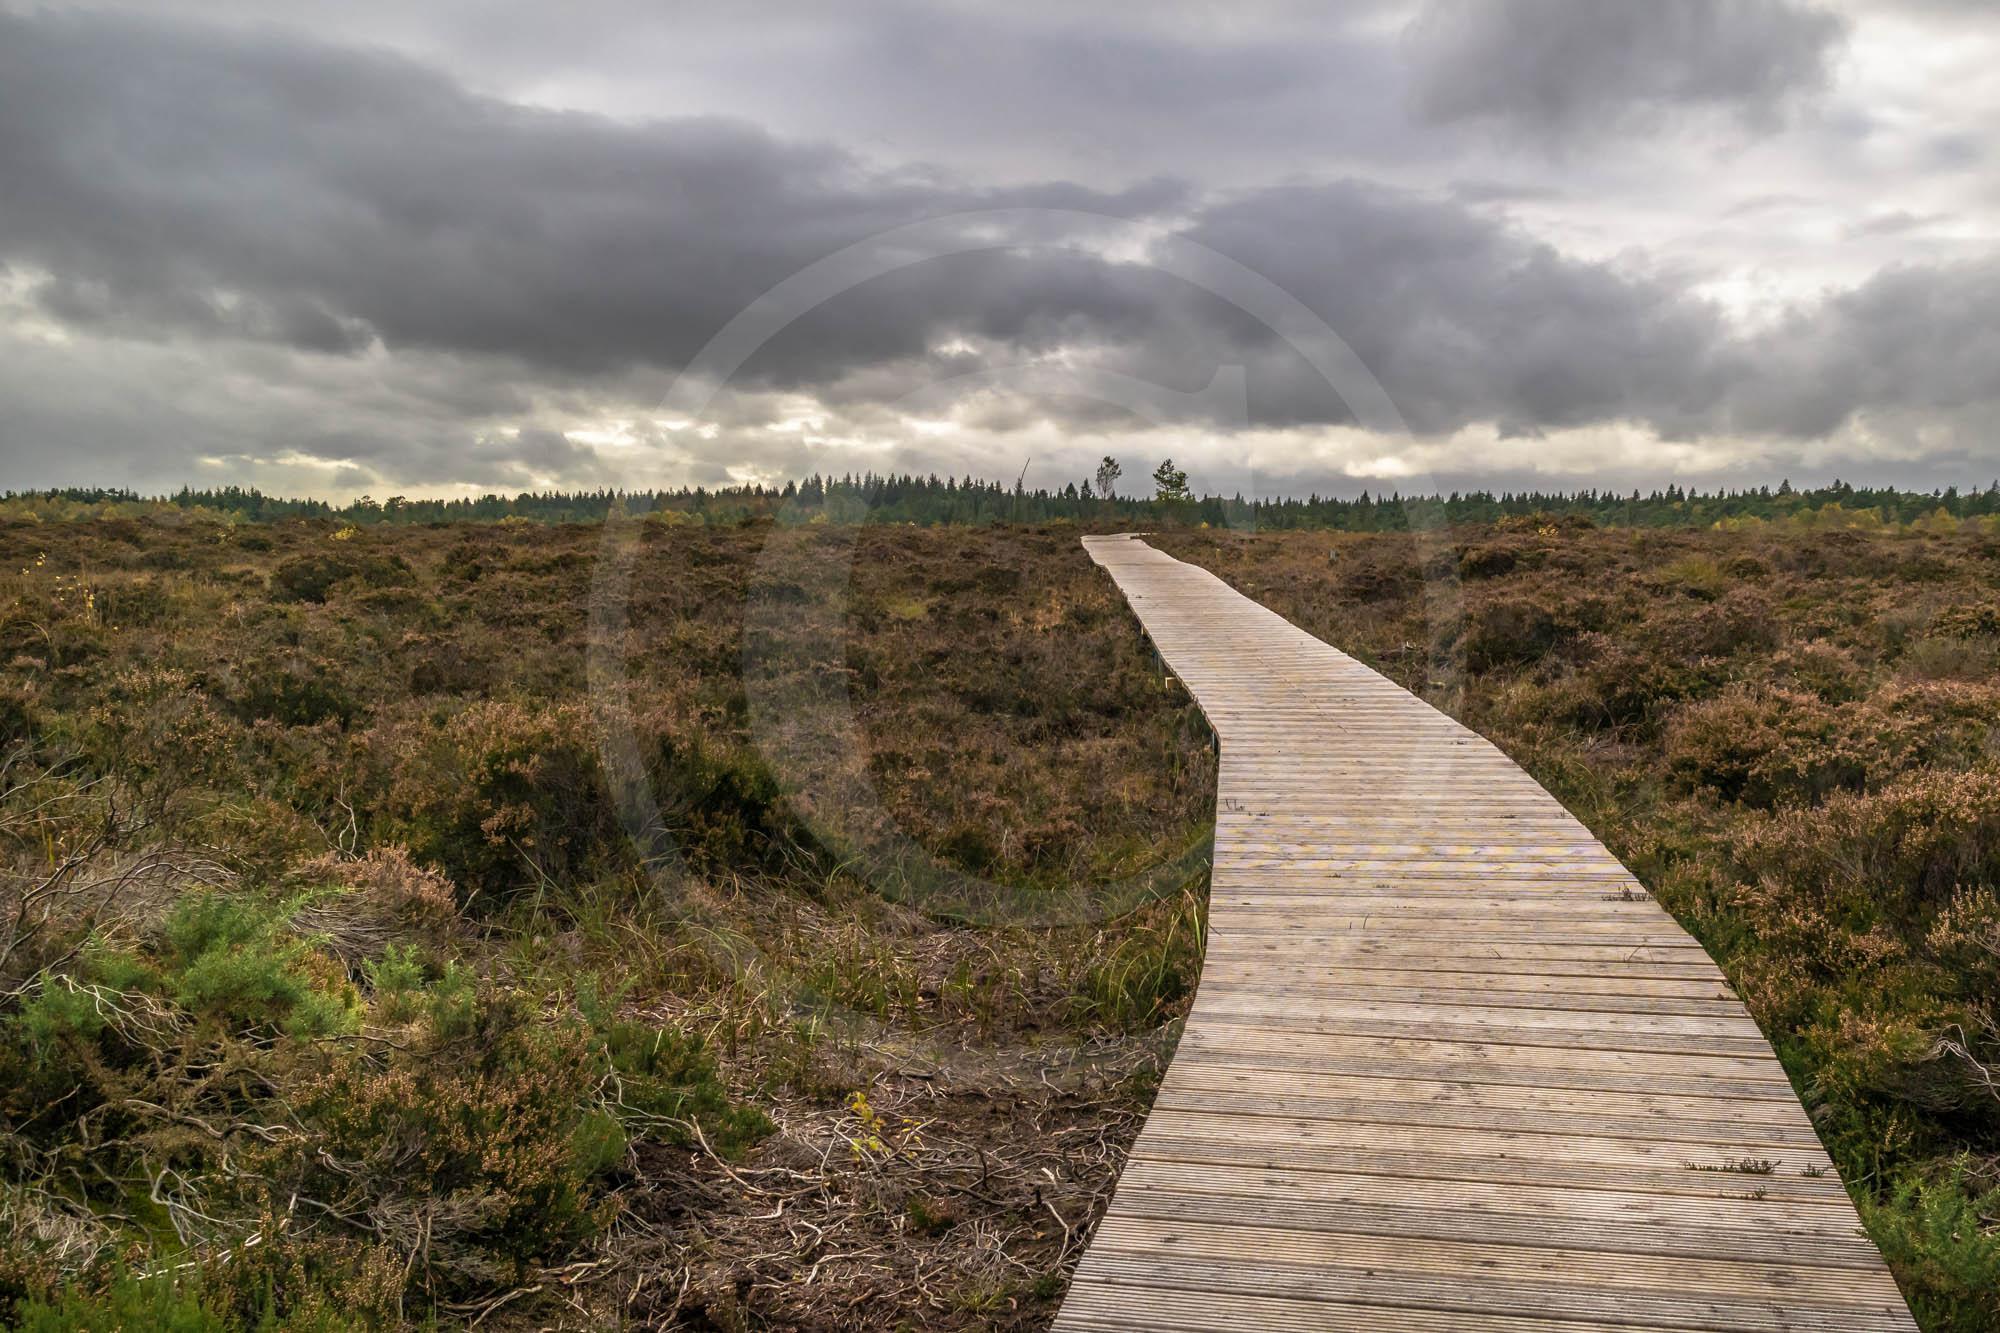 The Boardwalk through Abbeyleix Bog